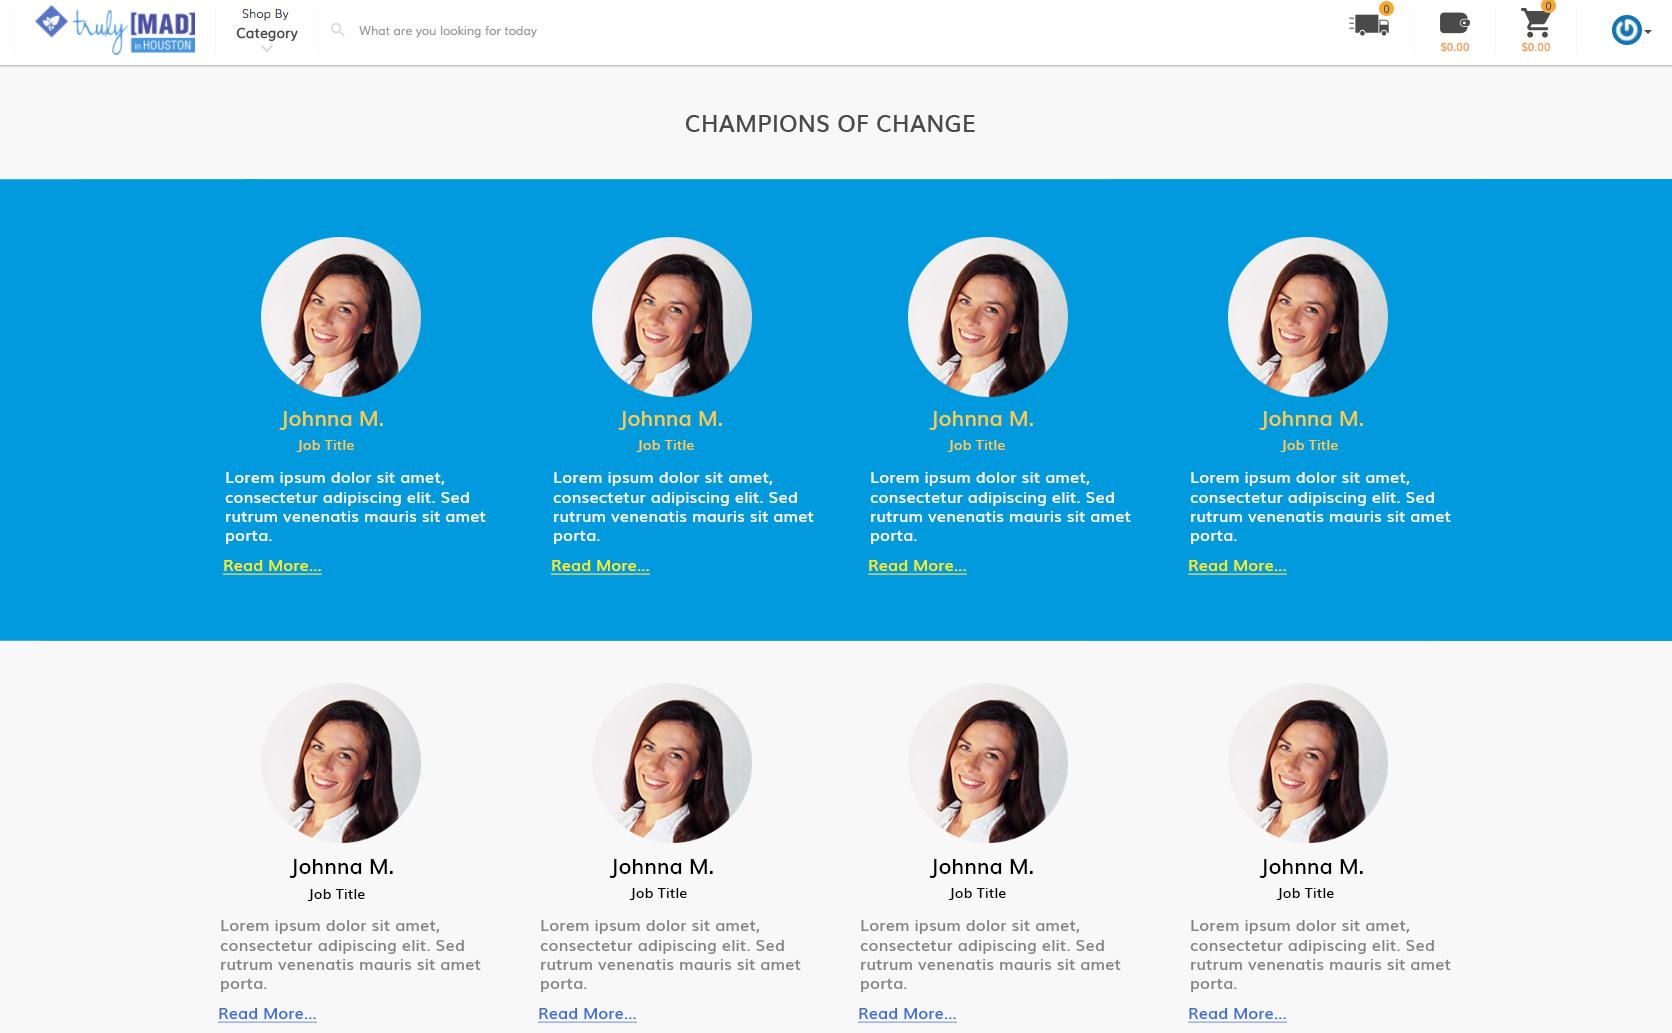 Ambassador_Listing_Page_2 copy.jpg